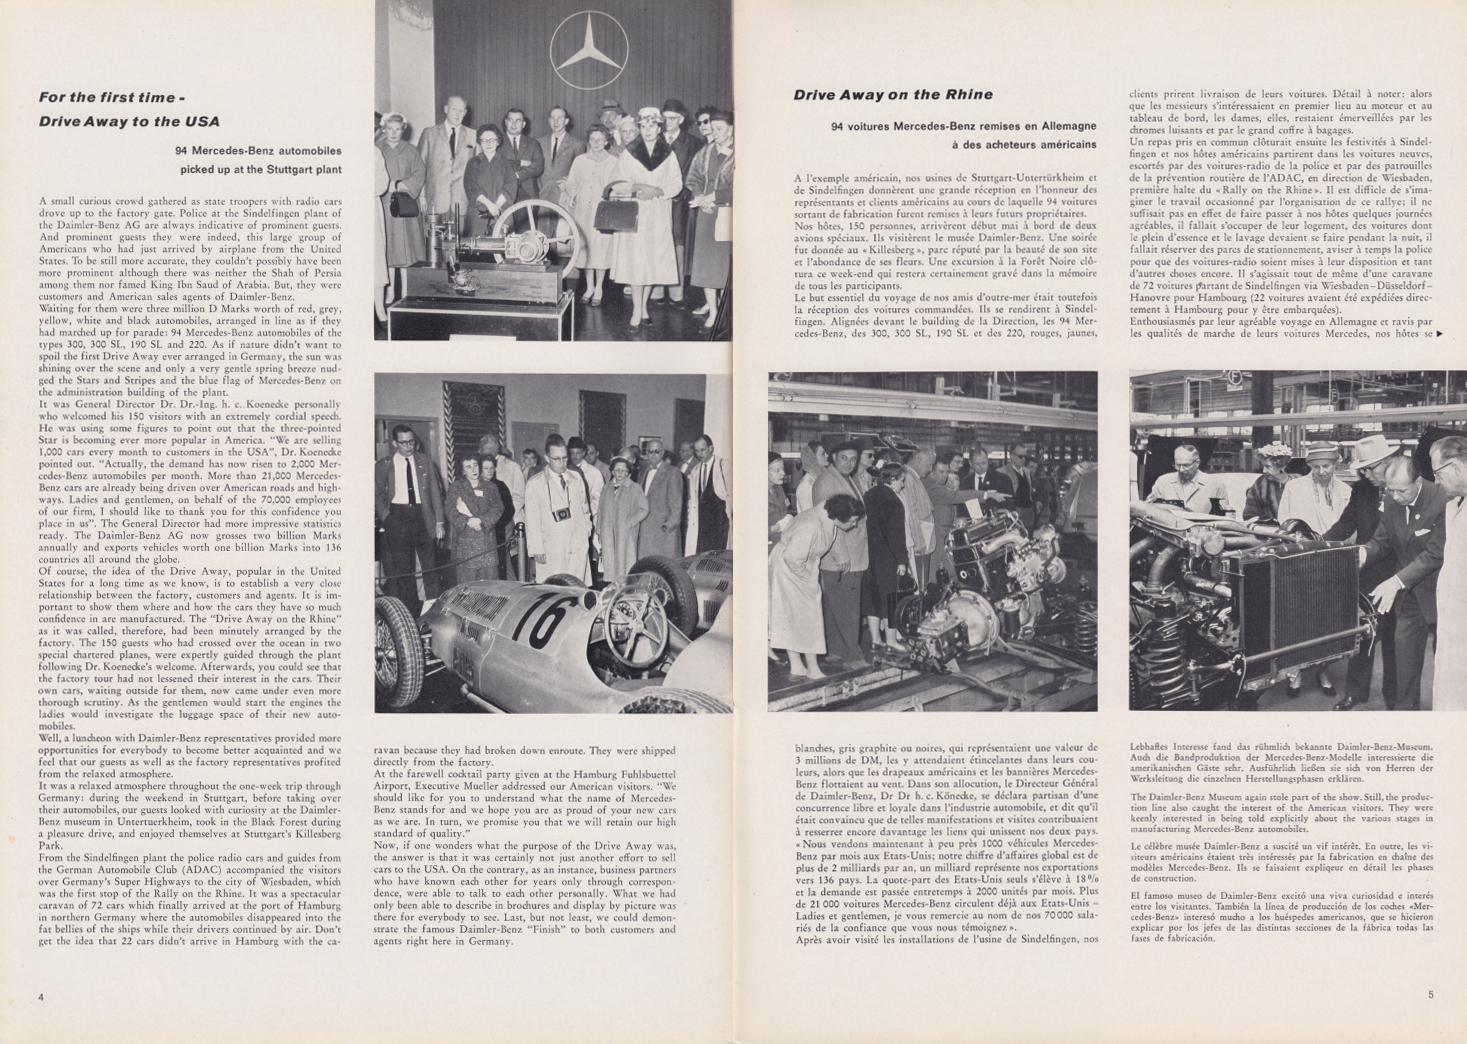 (REVISTA): Periódico In aller welt n.º 33 - Mercedes-Benz no mundo - 1959 - multilingue 003